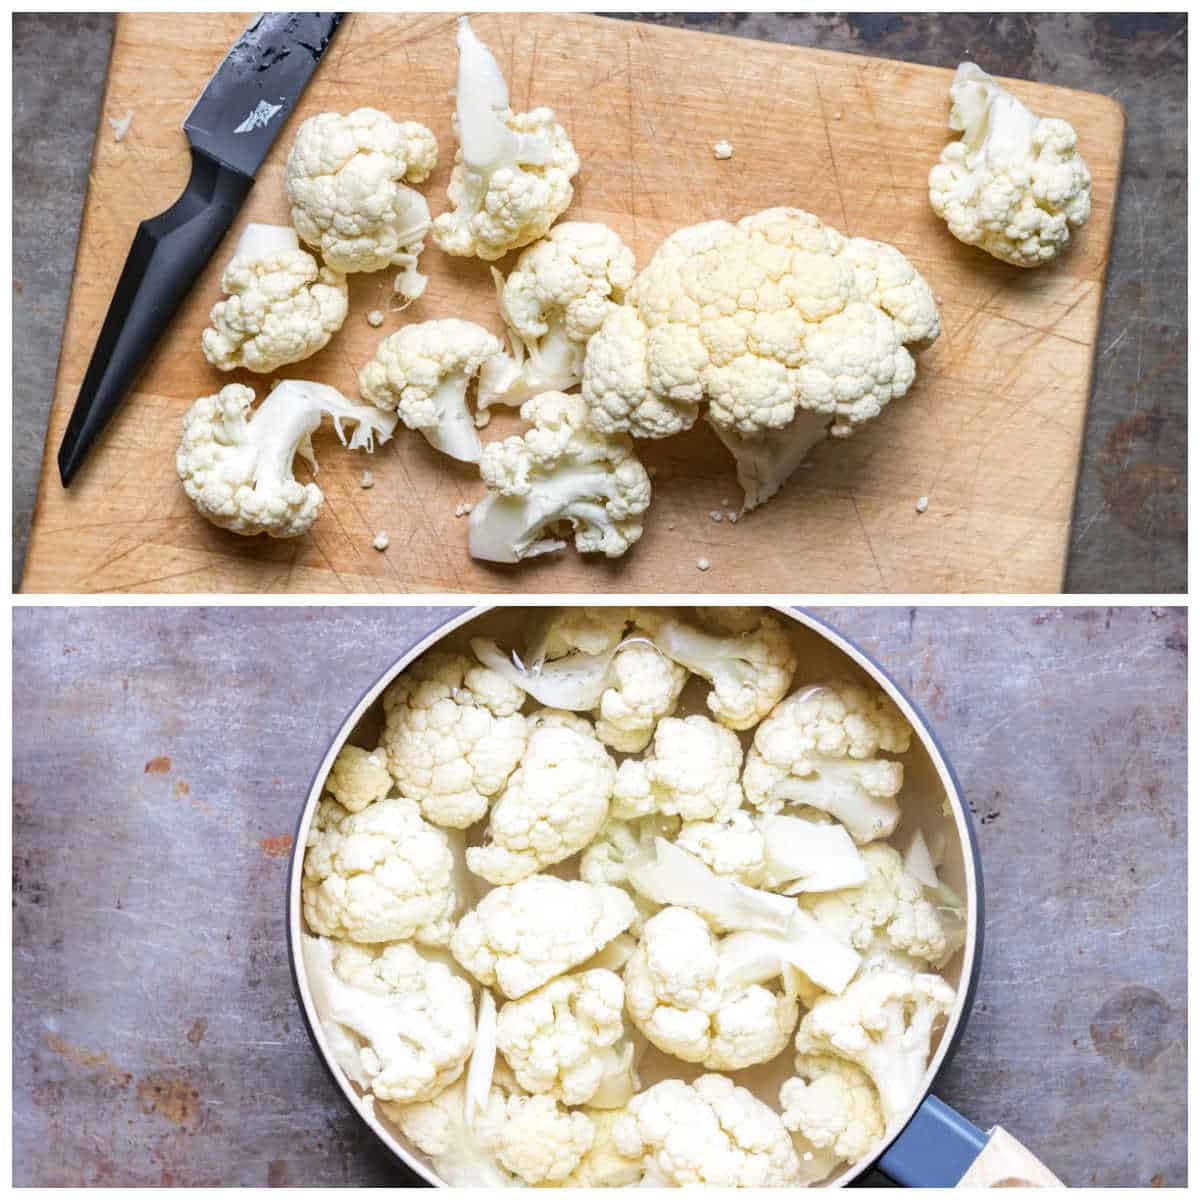 Collage: 1 chopped cauliflower, 2 in a pot.